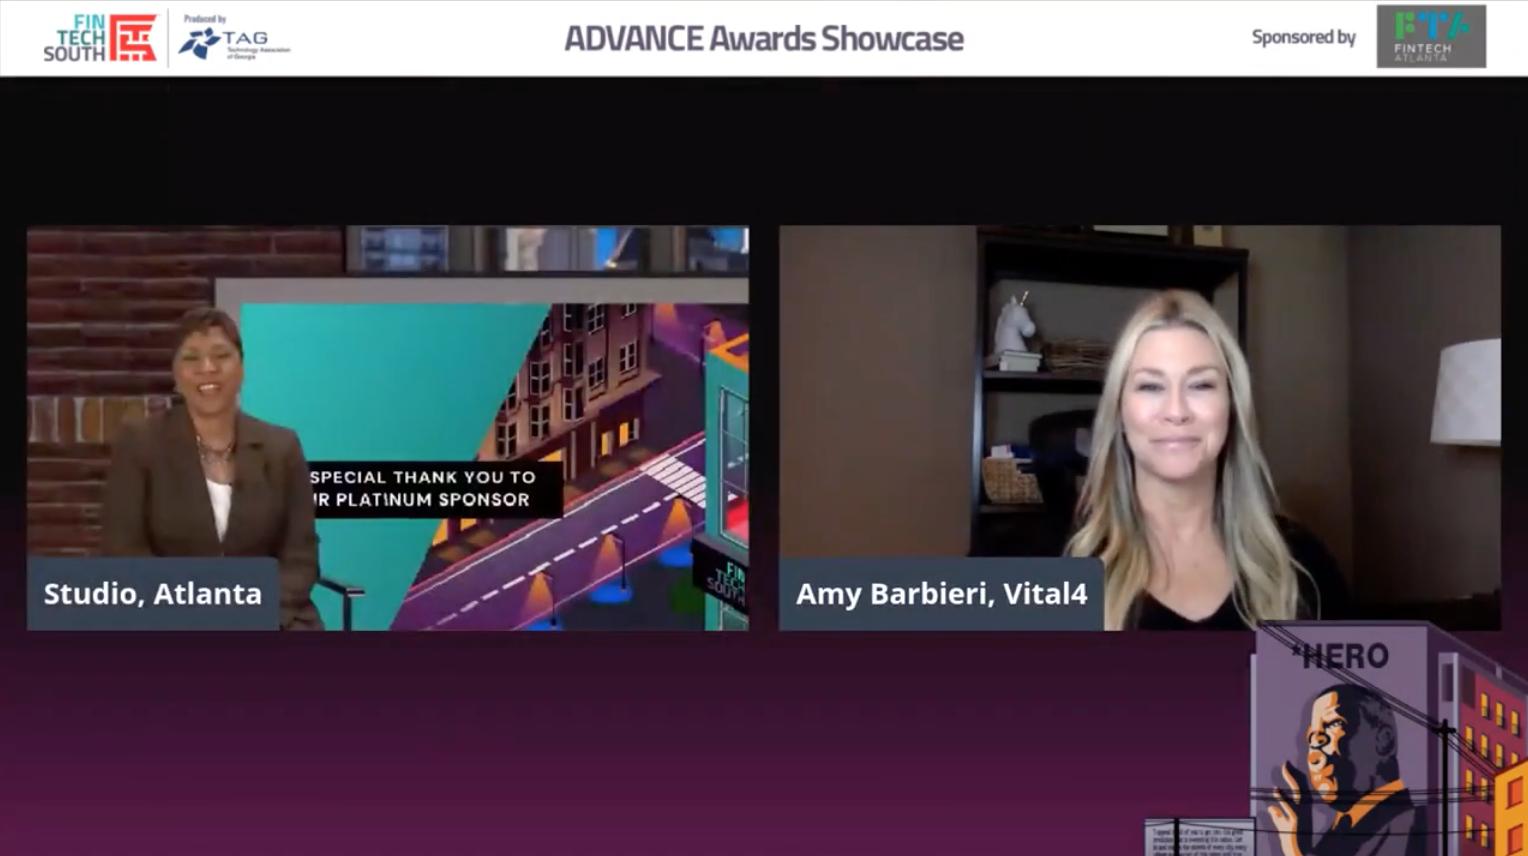 Sharing Vital4's Mission at the 2021 ADVANCE Awards Showcase